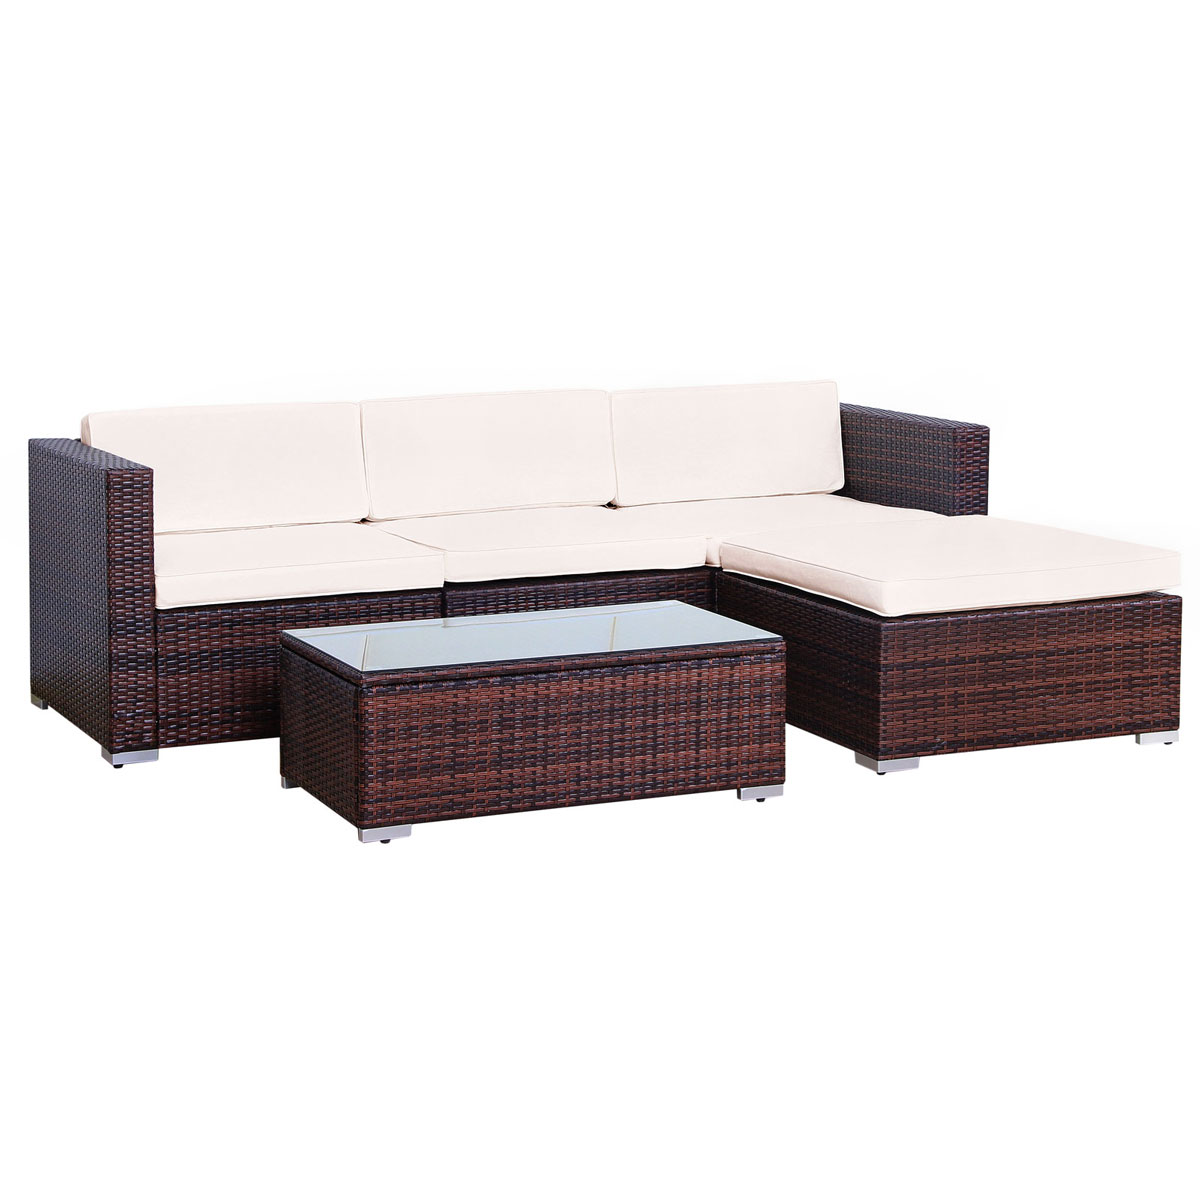 90961 SVITA CALIFORNIA Poly Rattan Lounge XL braun